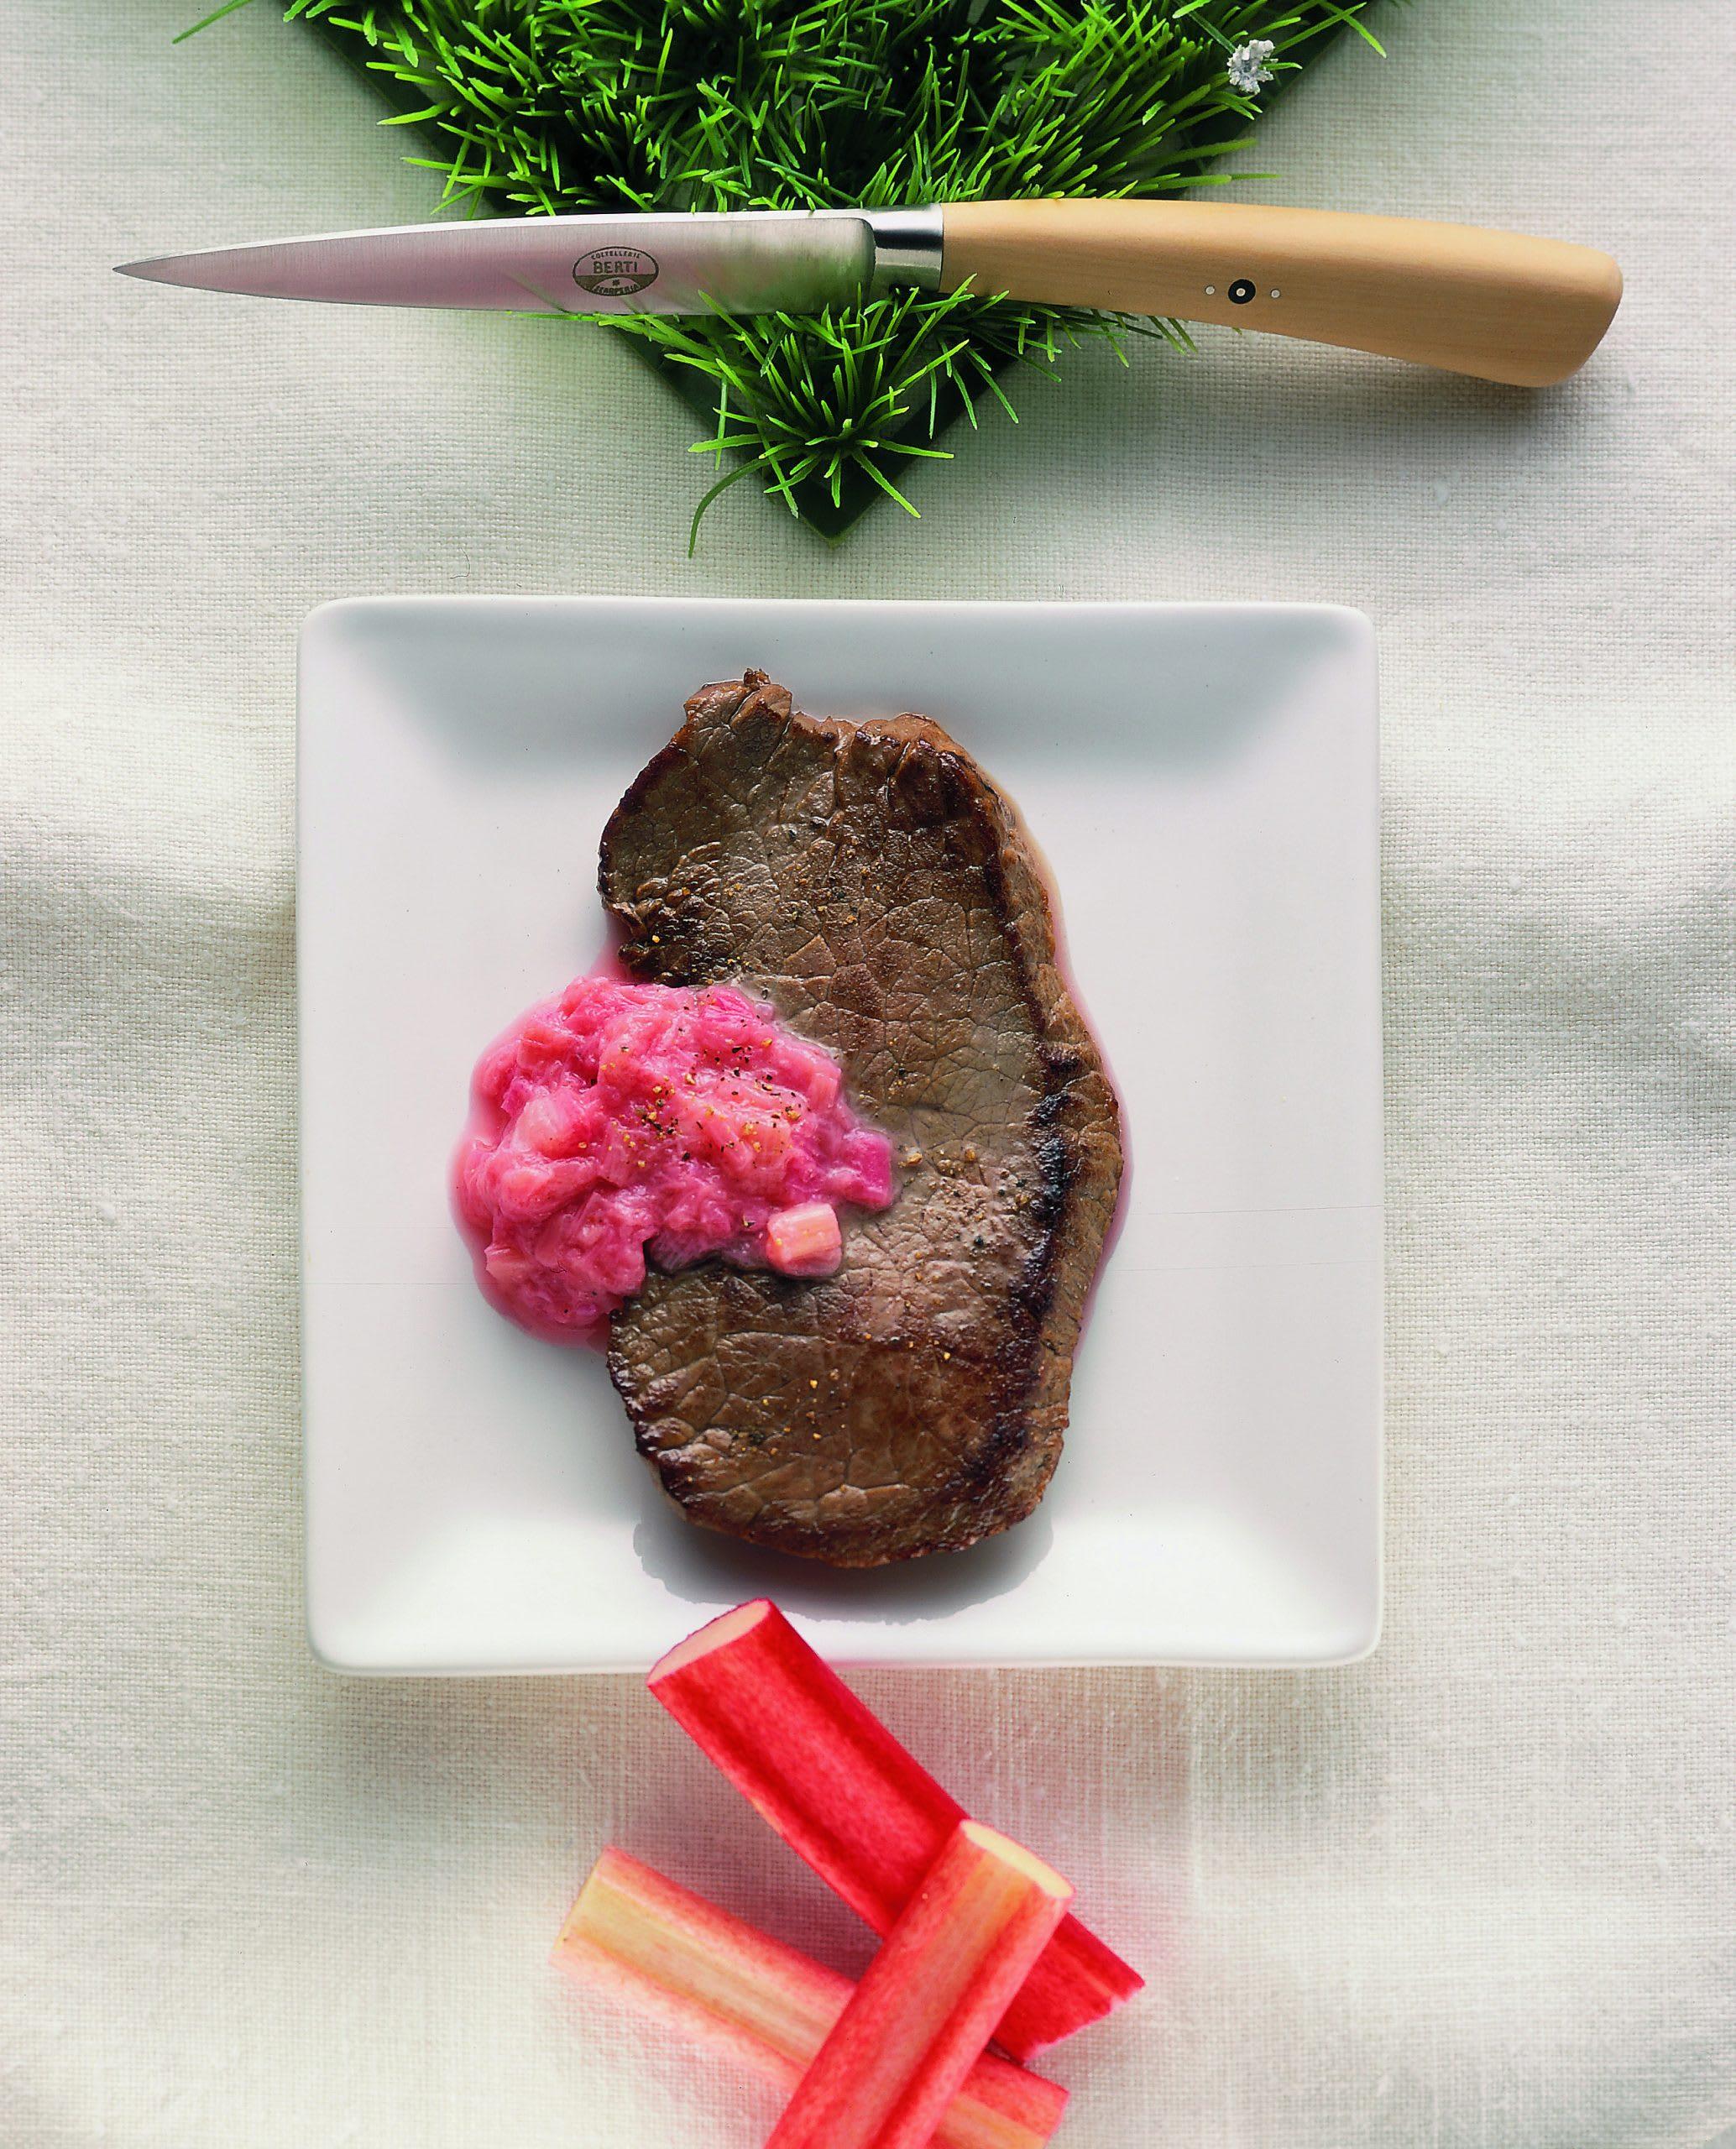 Rindsplätzli mit Rhabarber-Knoblauch-Sauce